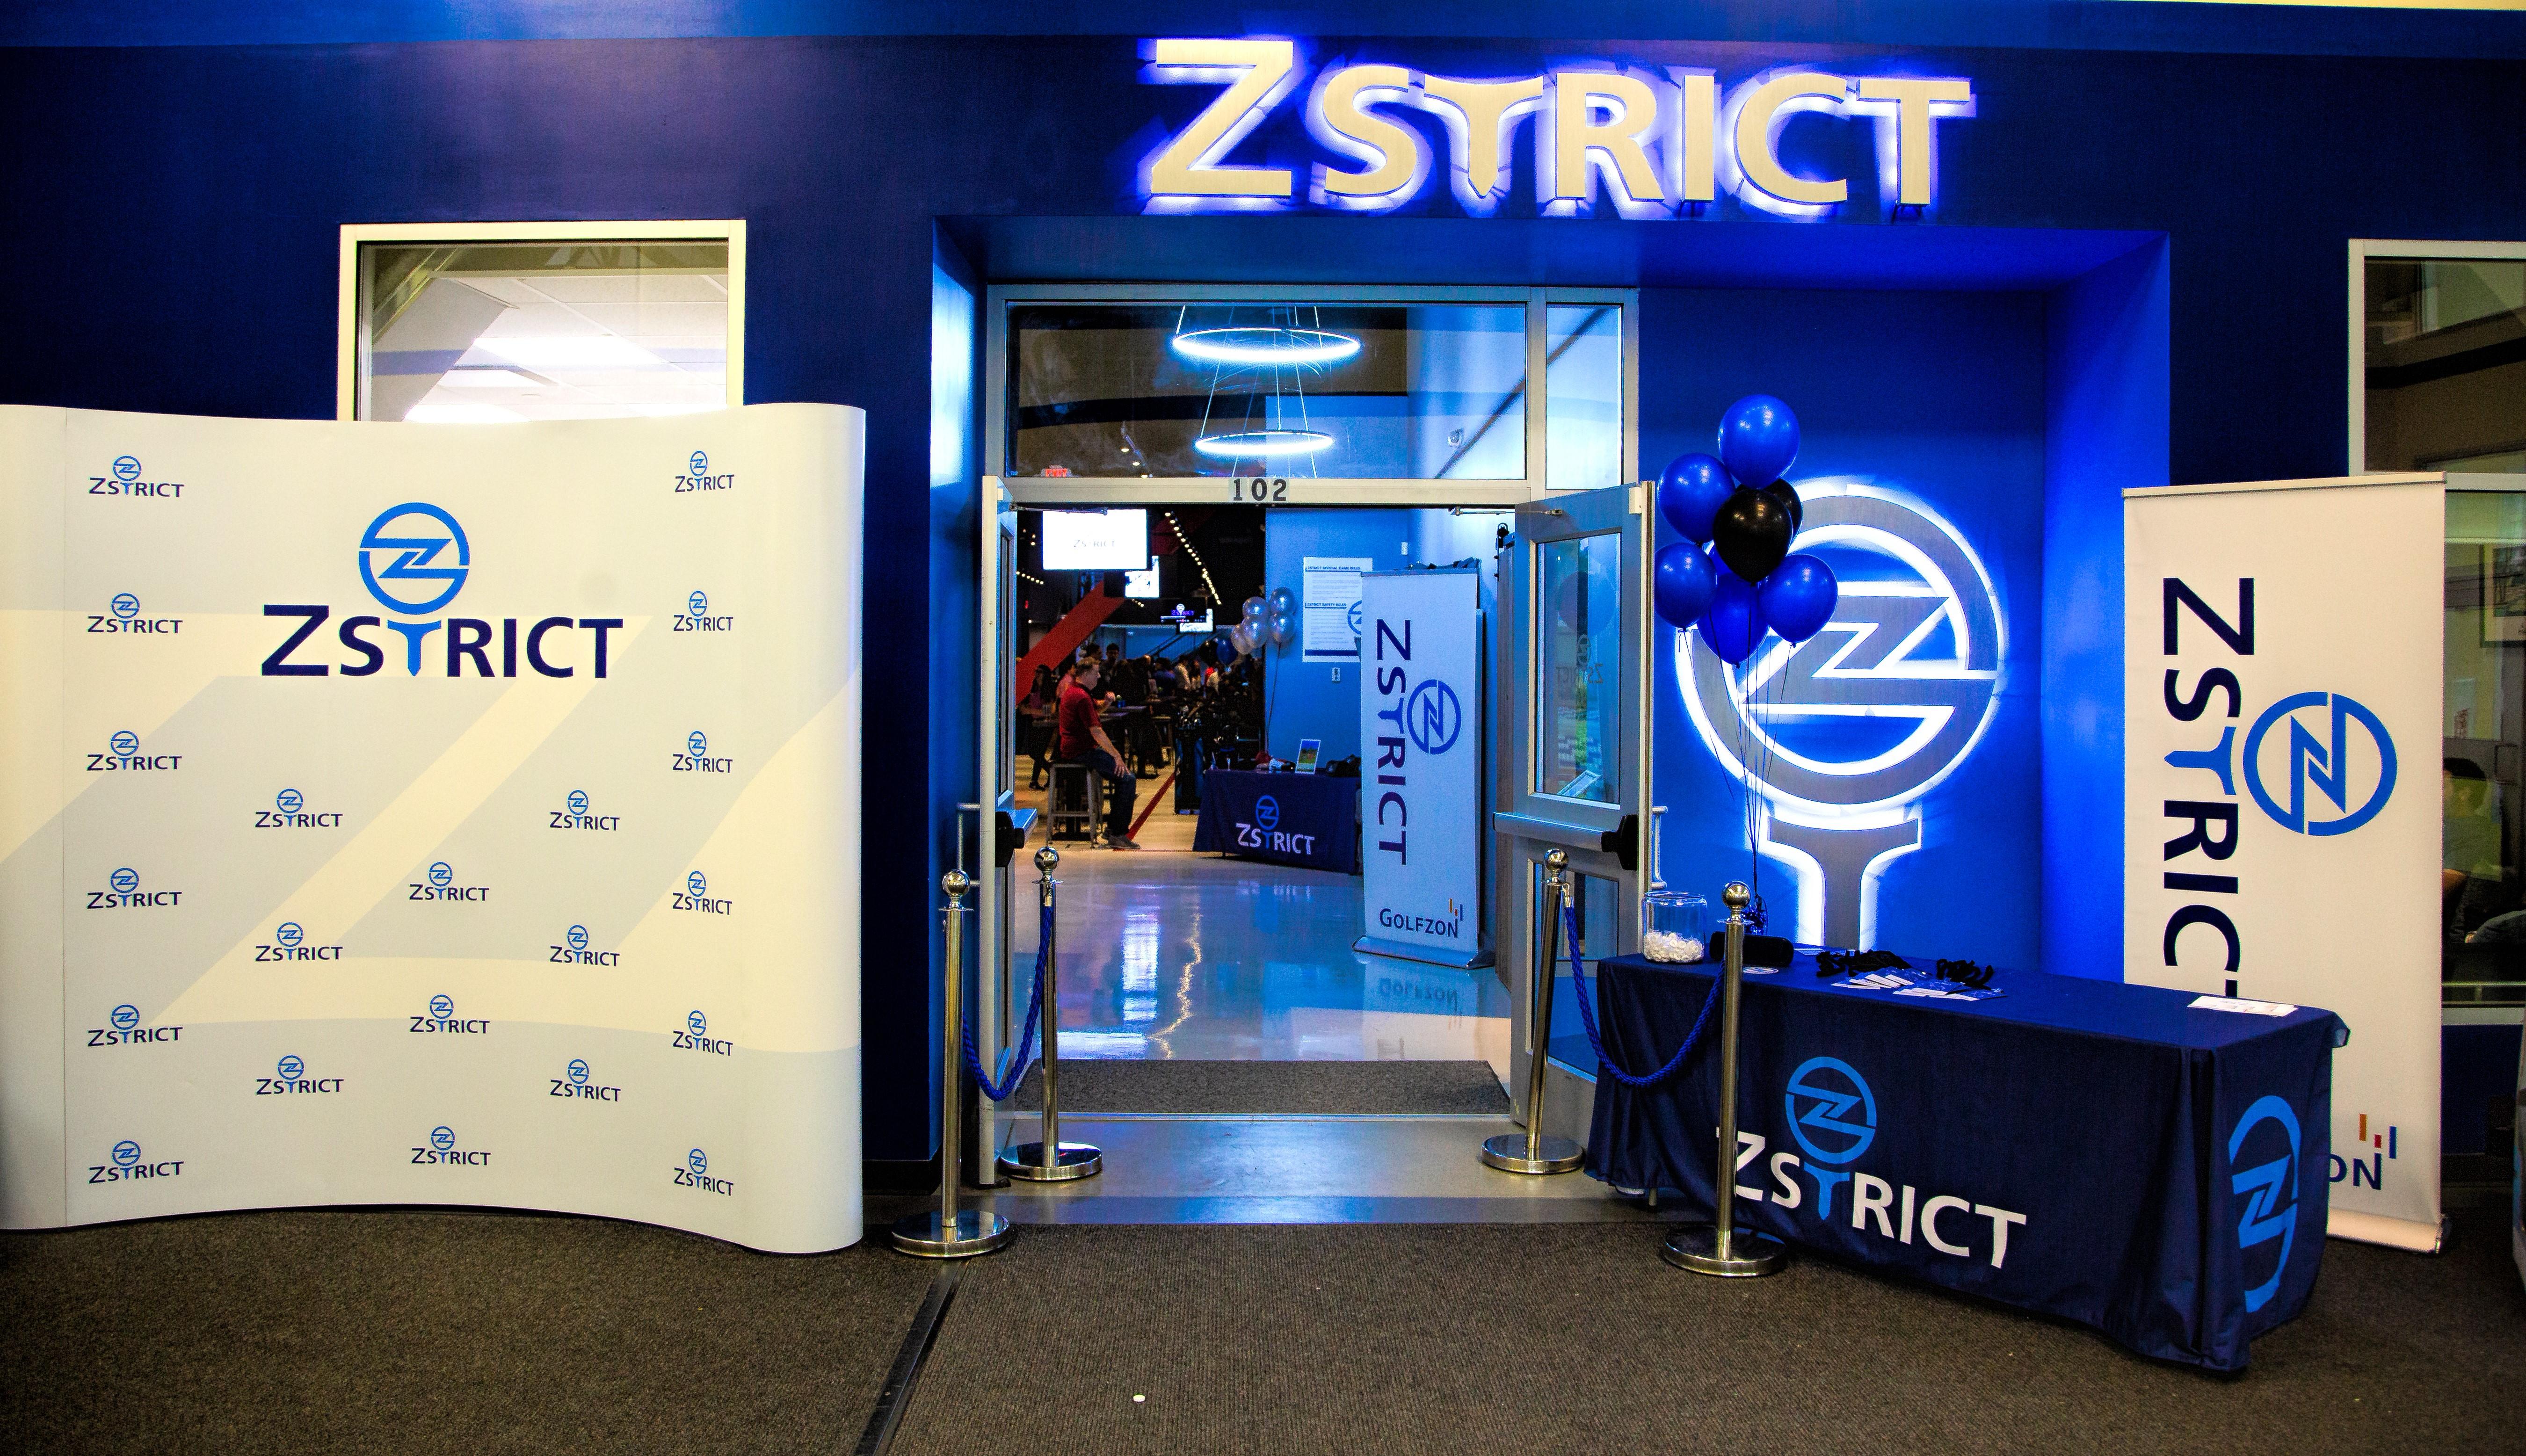 ZSTRICT Entrance 2